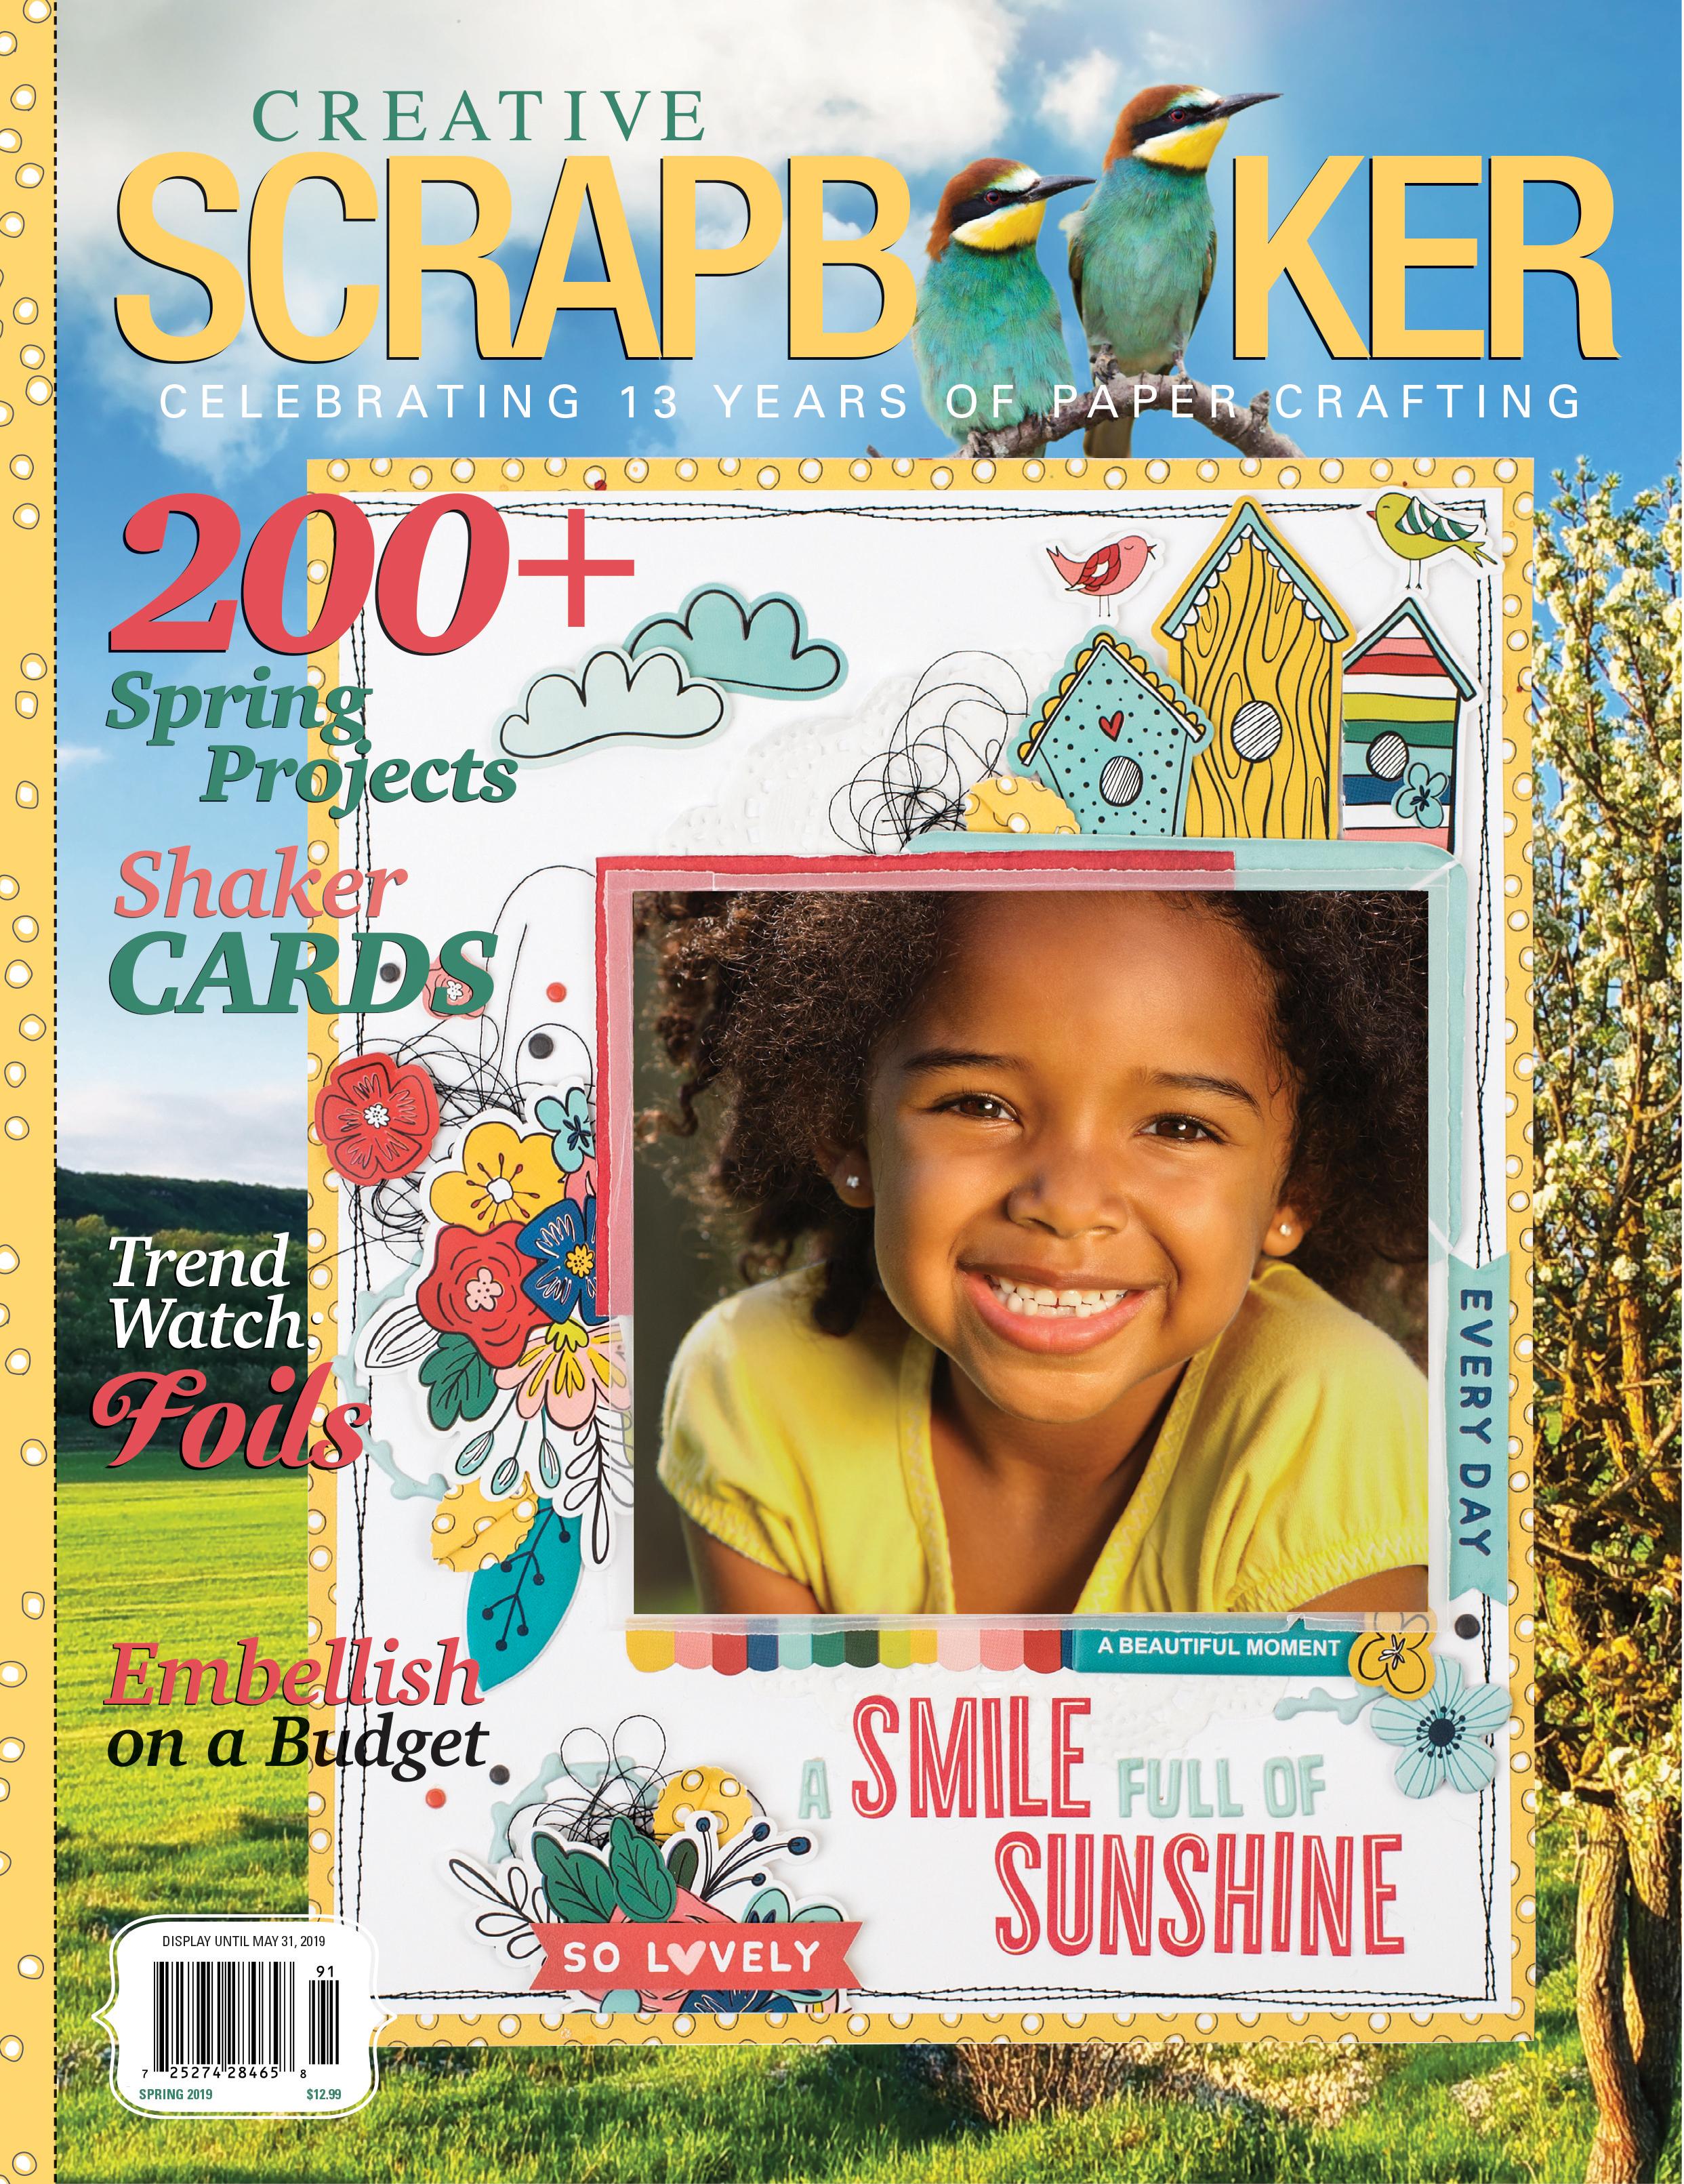 Creative Scrapbooker Magazine Spring 2019